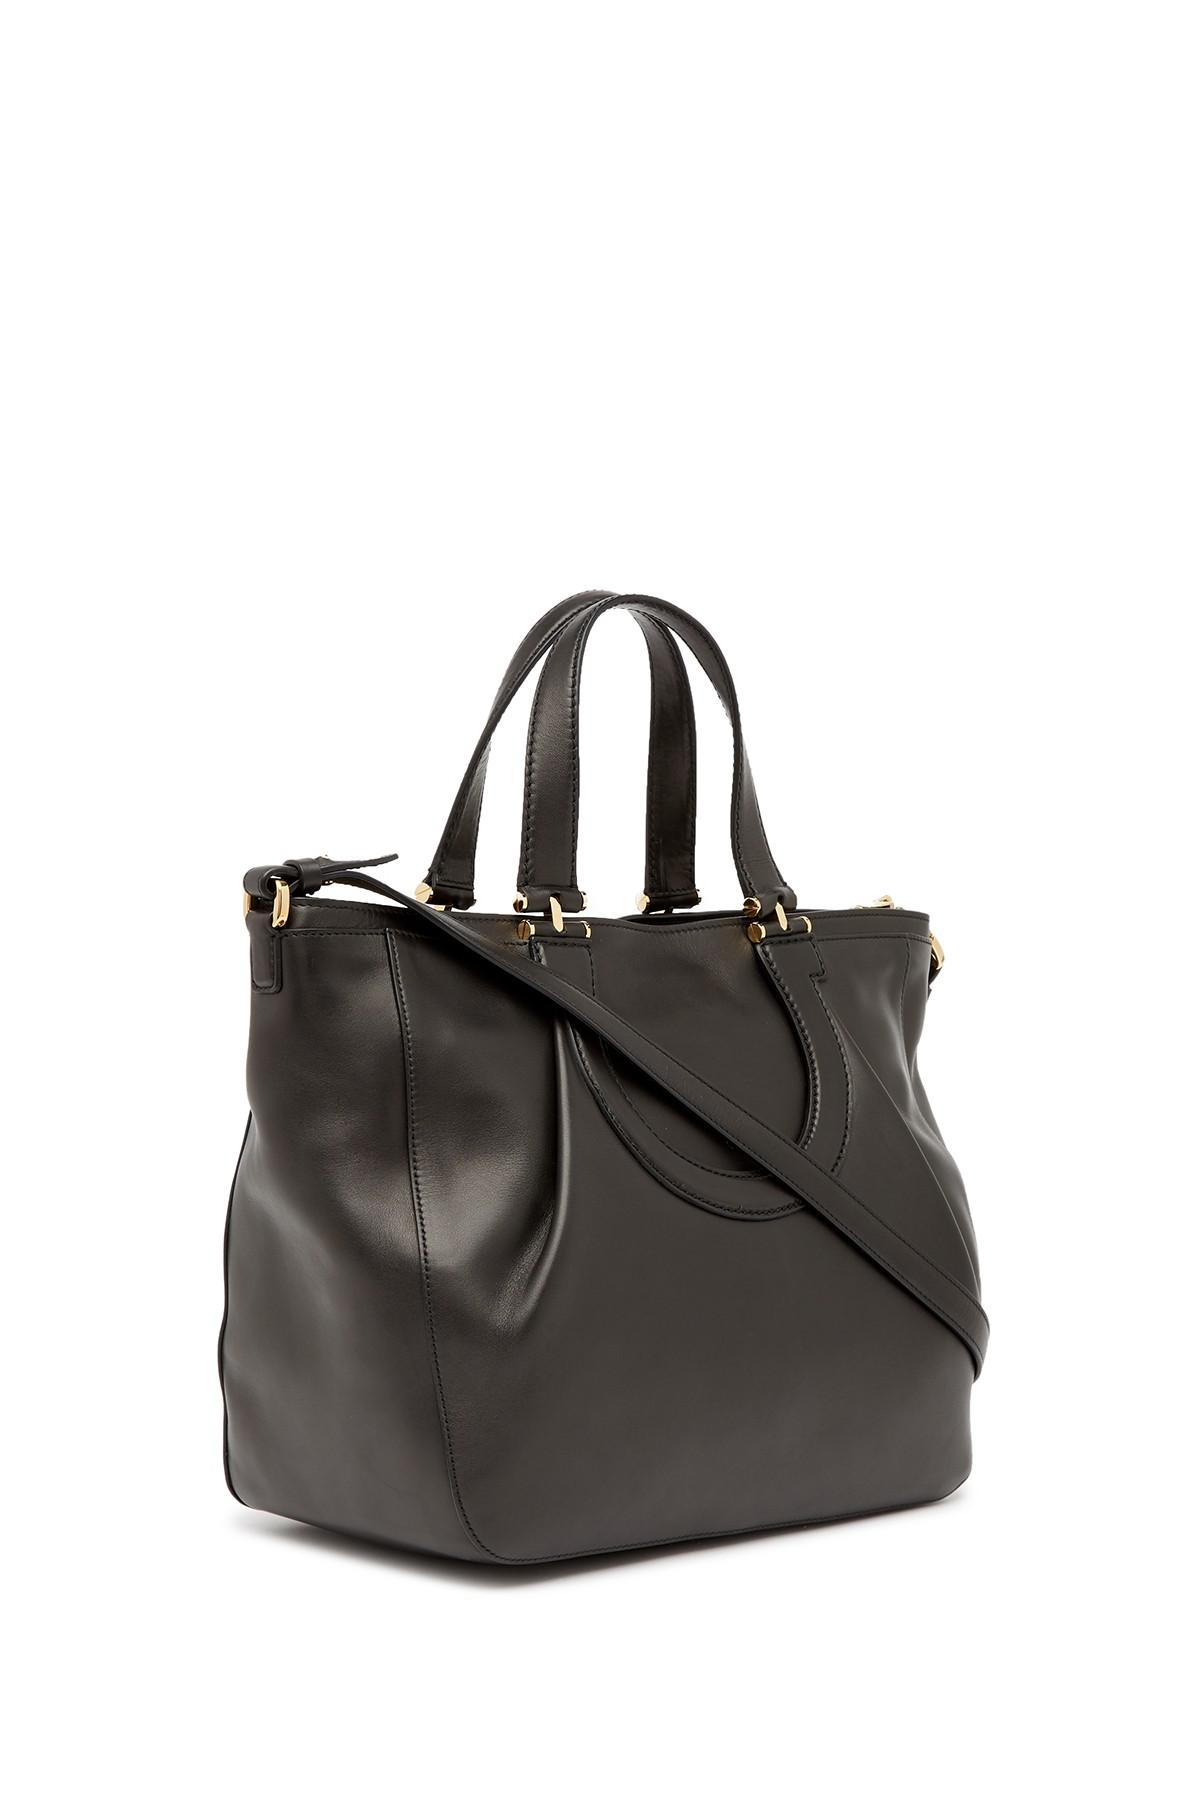 Ferragamo - Black Leather Tote Bag - Lyst. View Fullscreen 35851c5b705ad